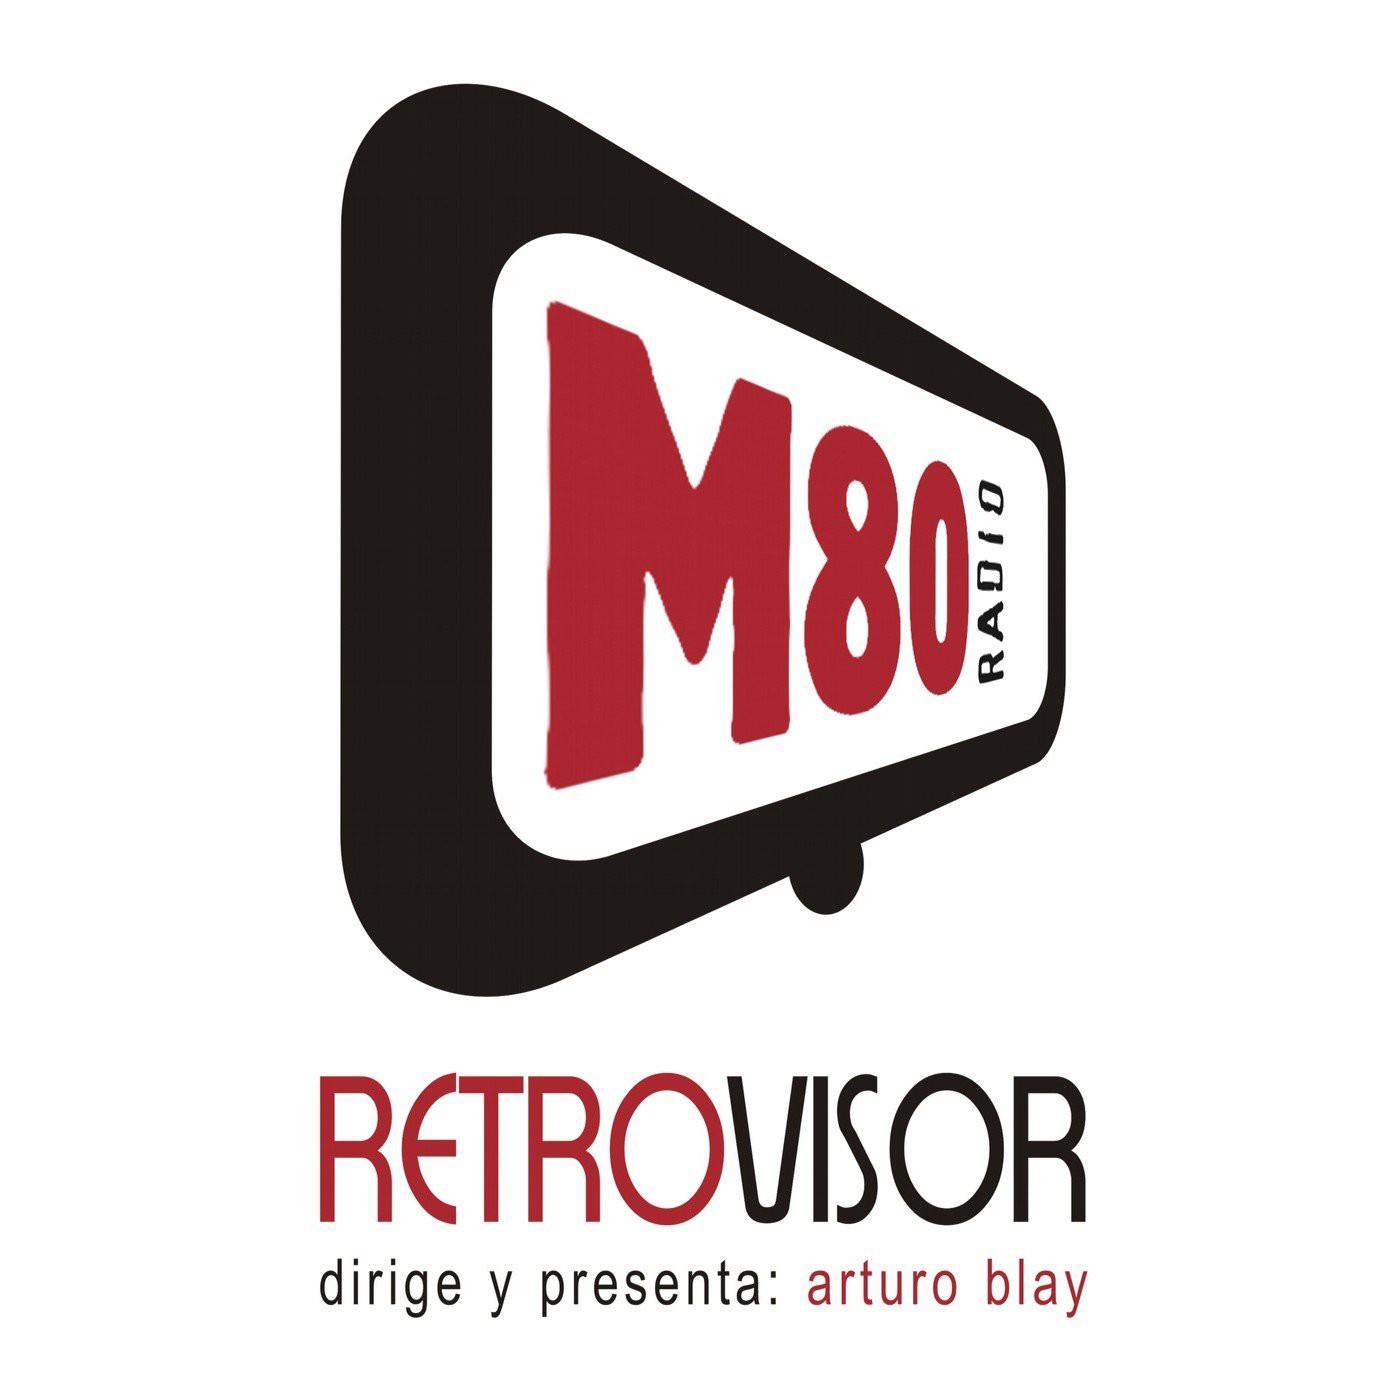 <![CDATA[RETROVISOR - M80 Radio]]>